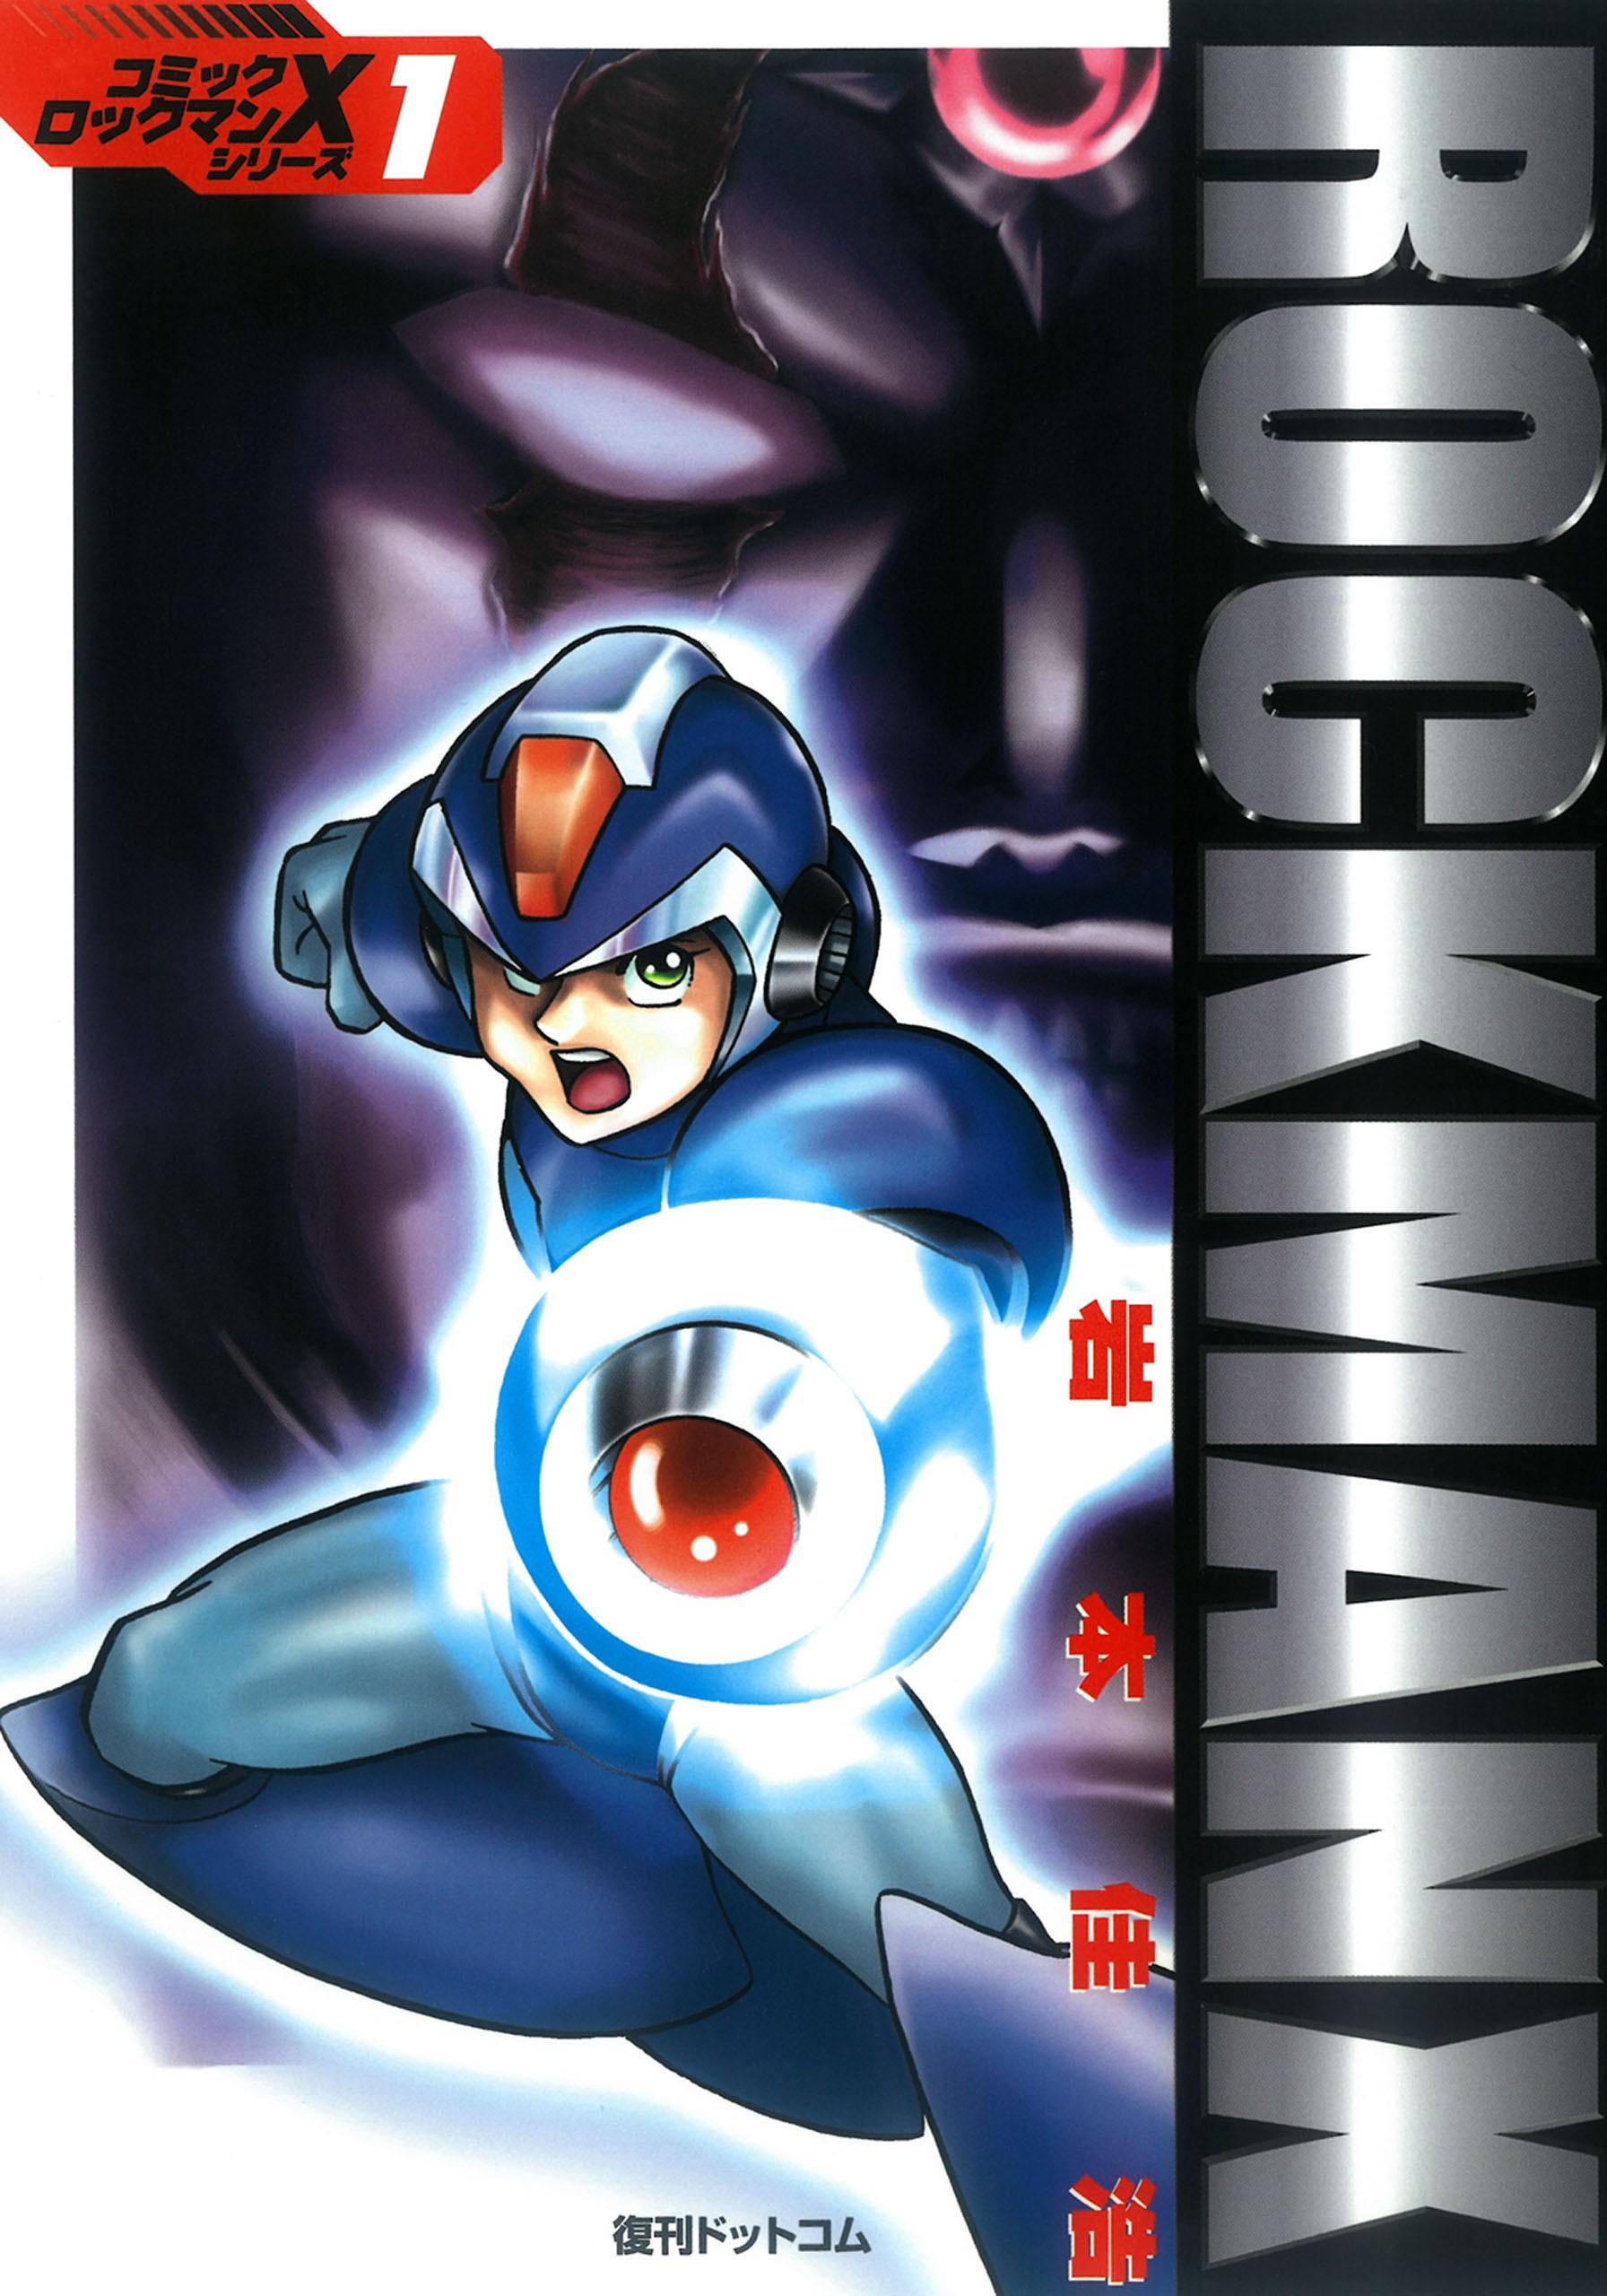 File:RockmanX1.jpg